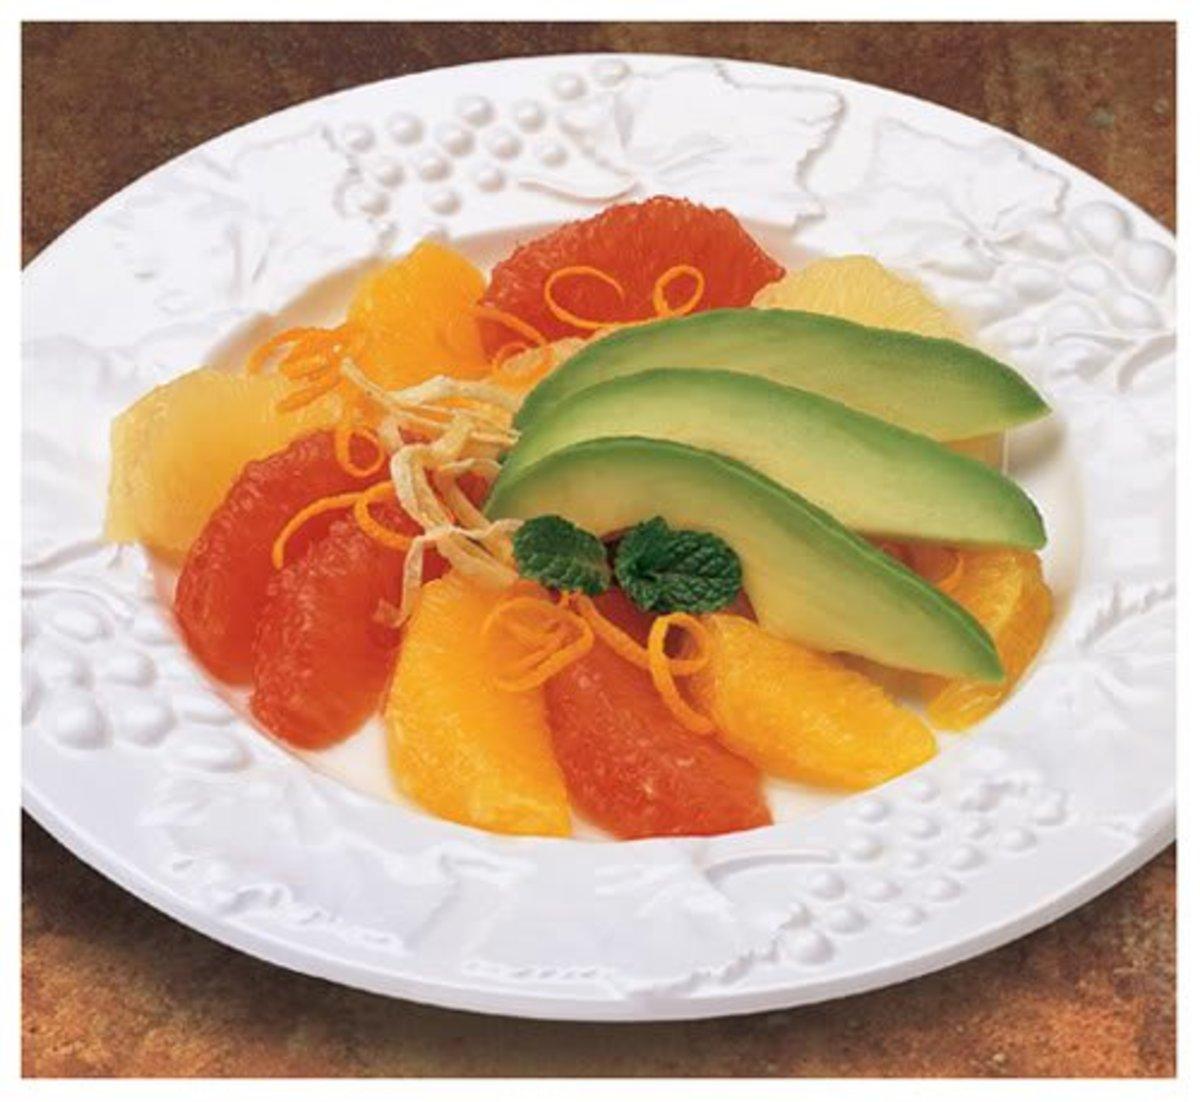 CaliforniaAvocadoGrapefruitSalad1